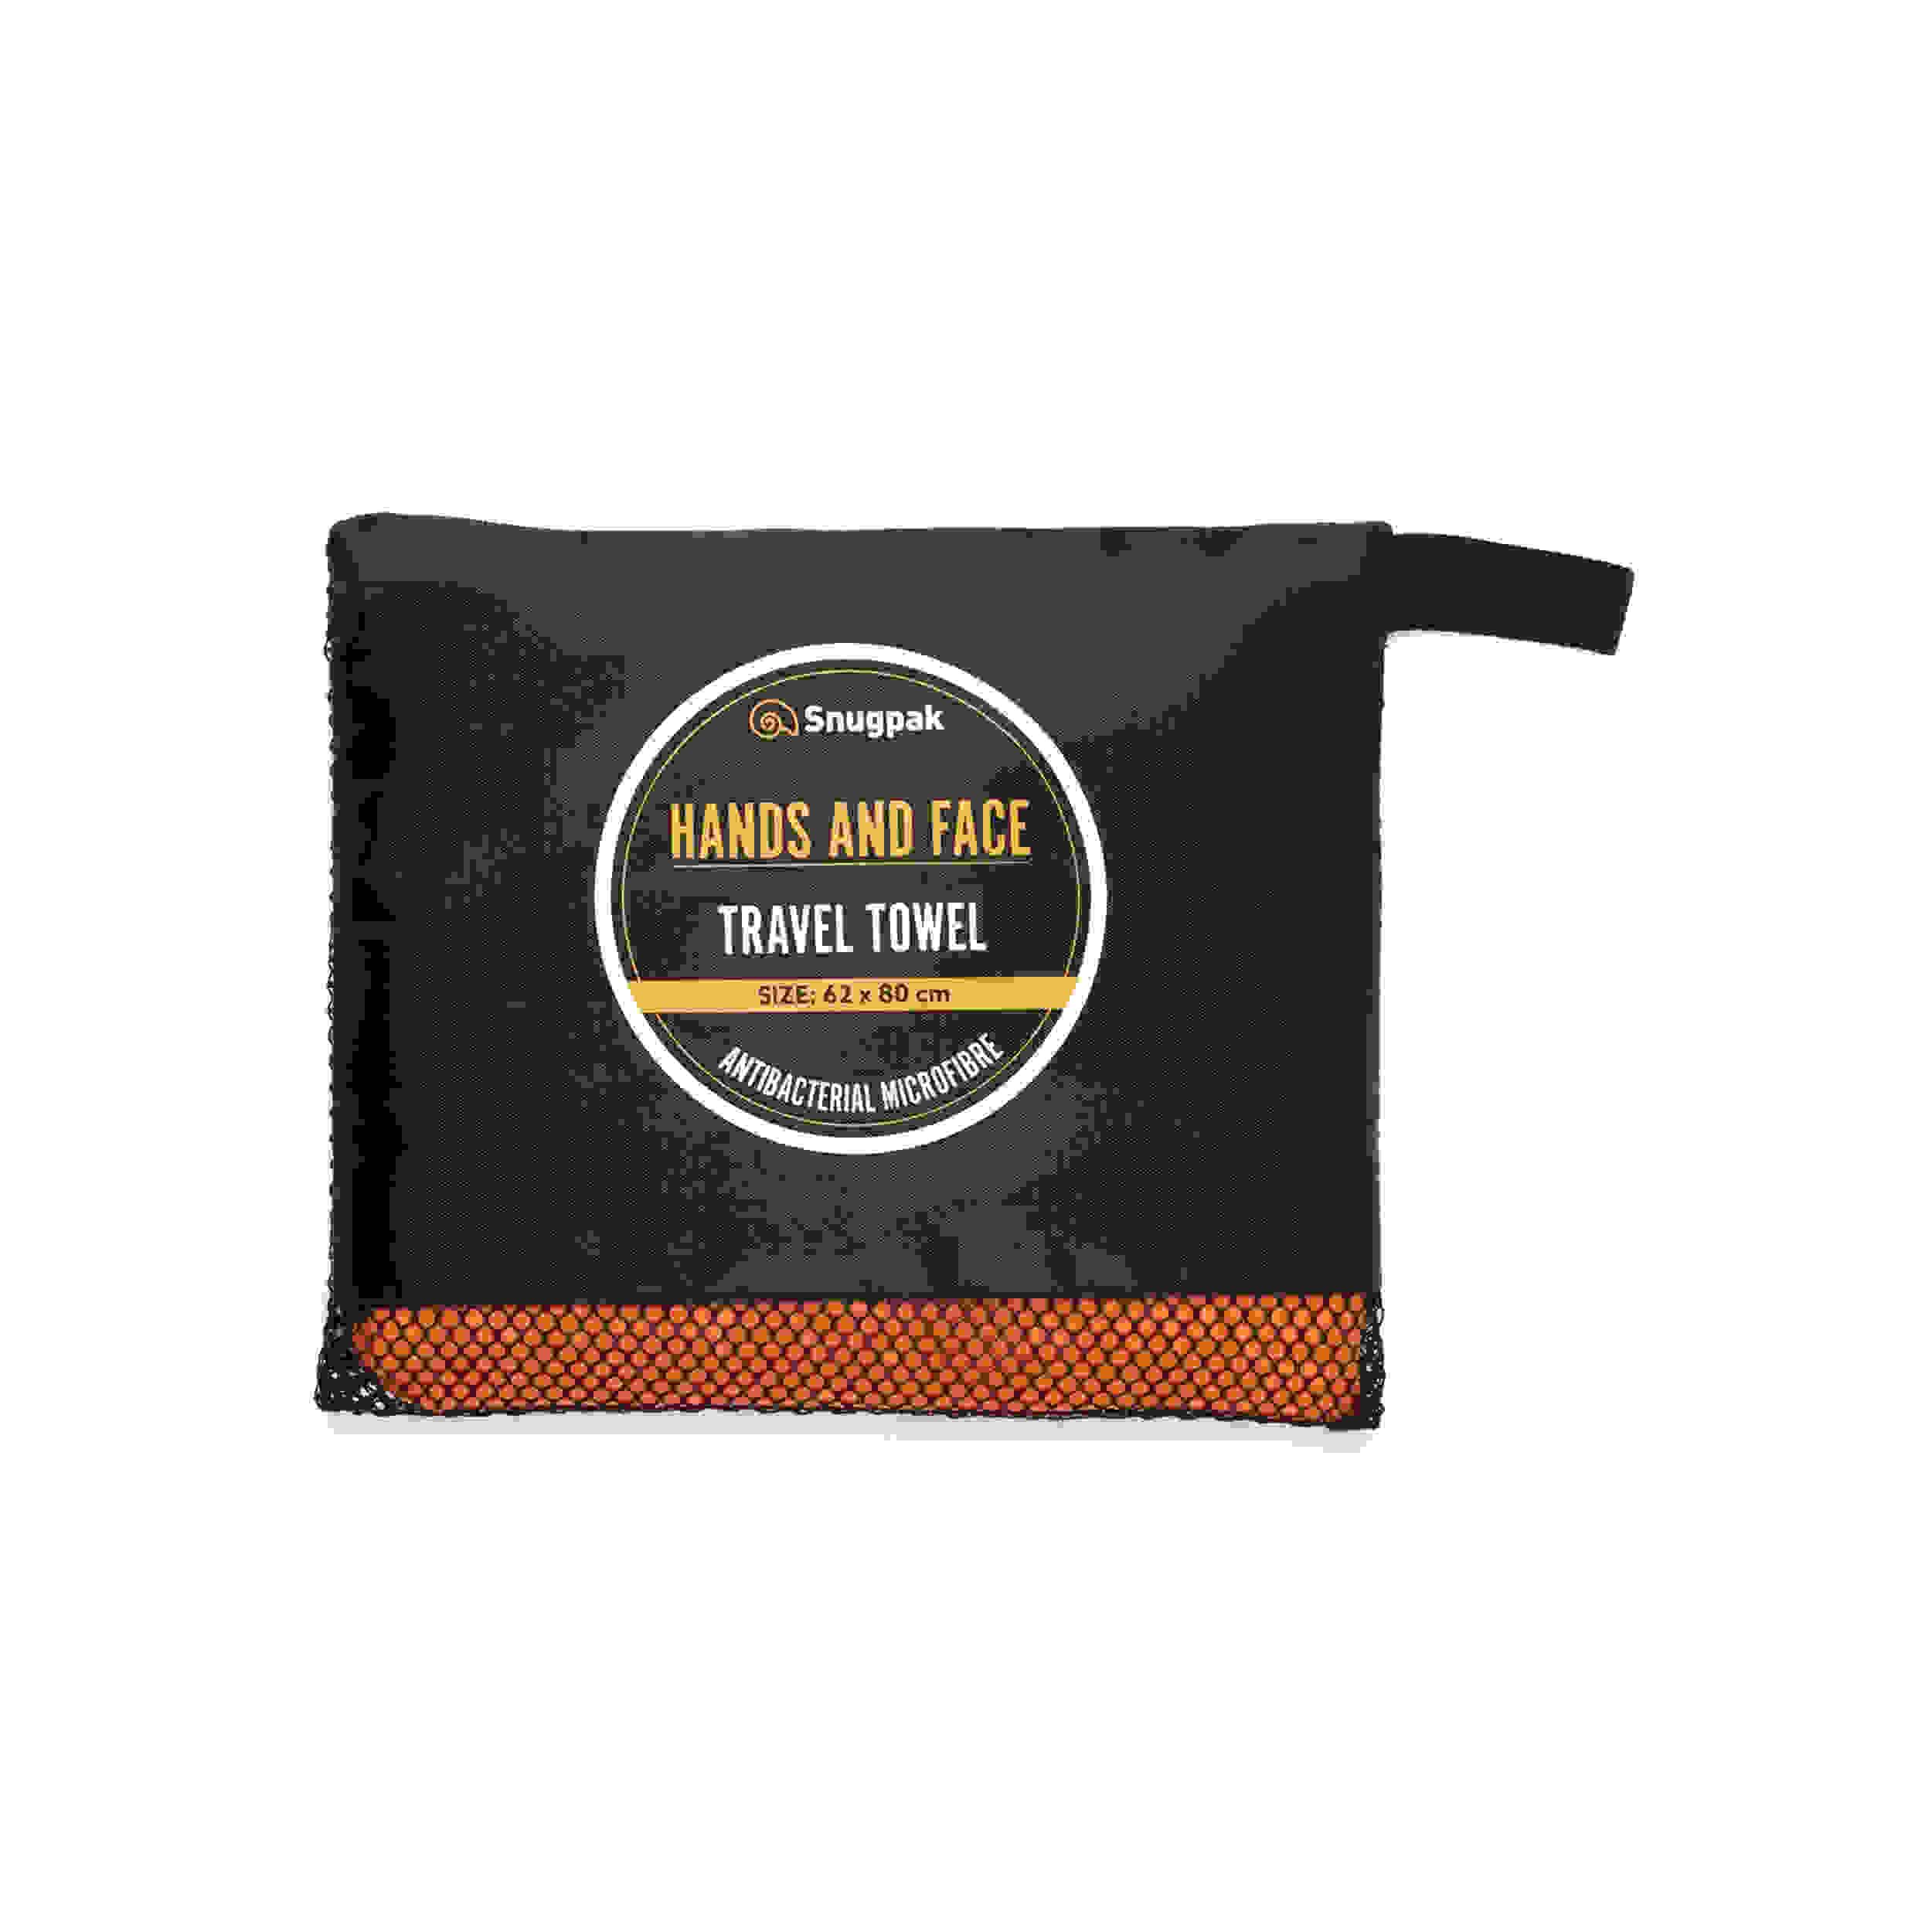 Snugpak Travel Towel Hands and Face Orange